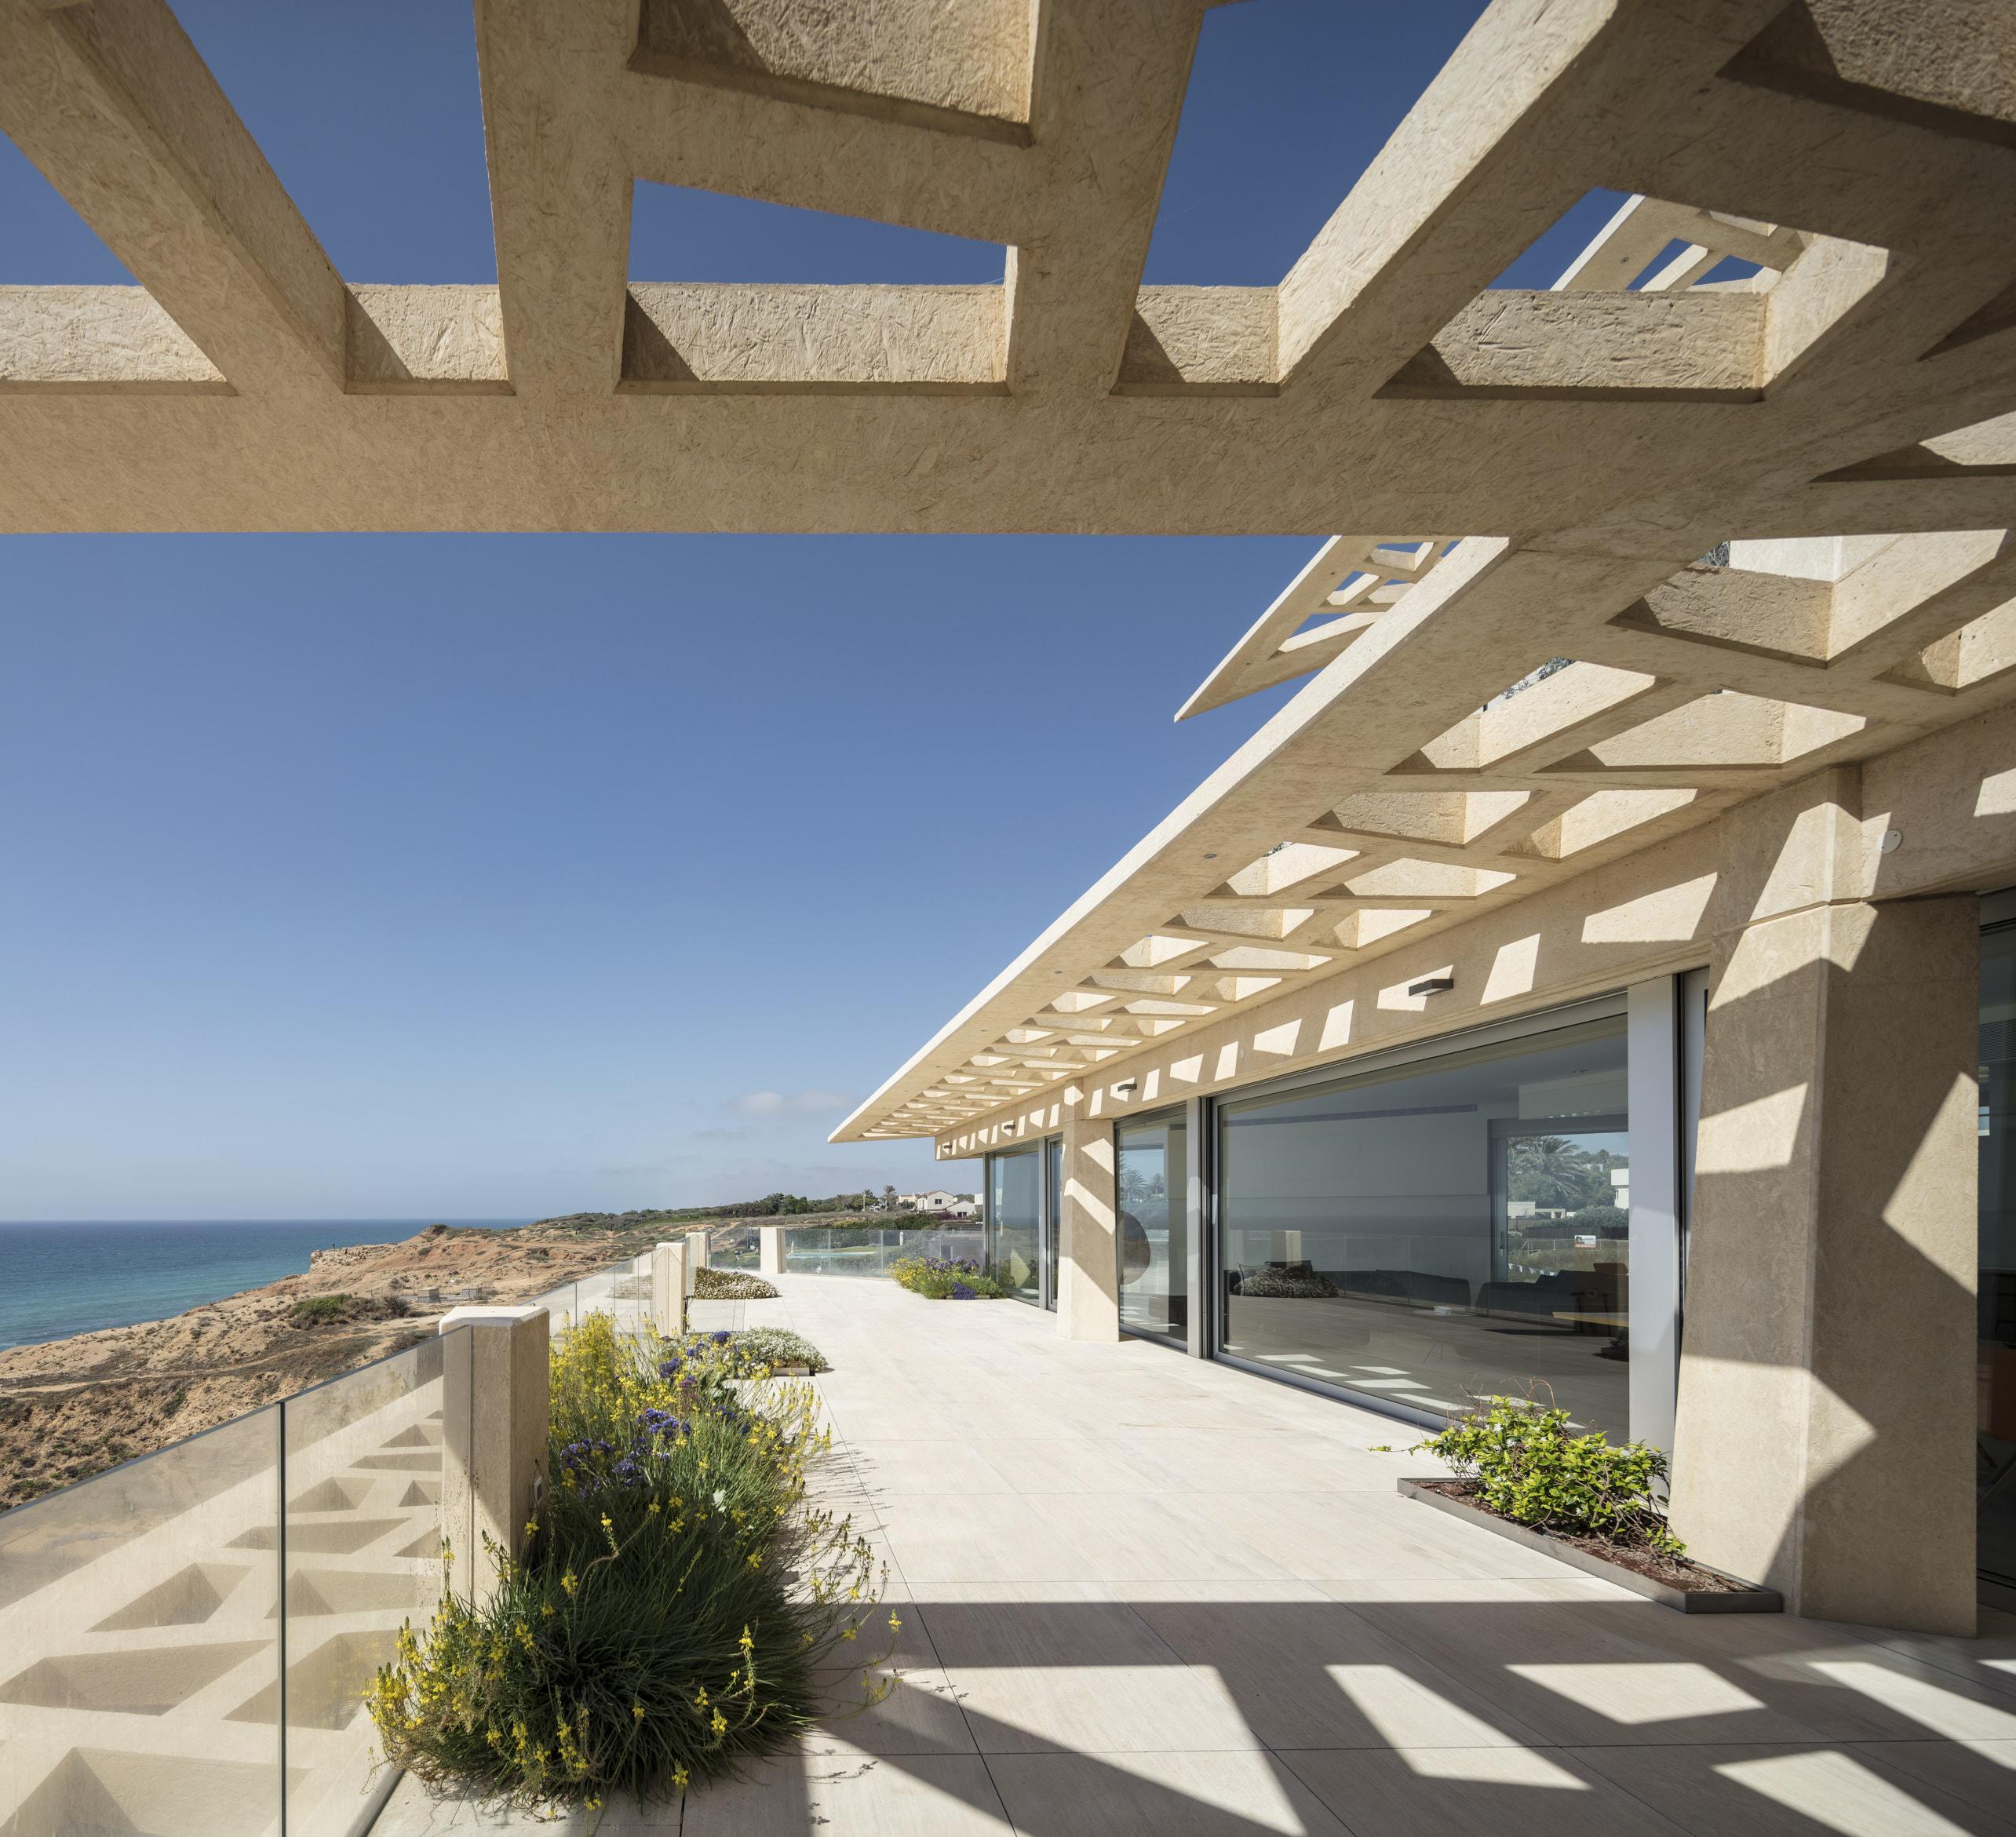 Le terrazze / Gottesman-Szmelcman Architecture